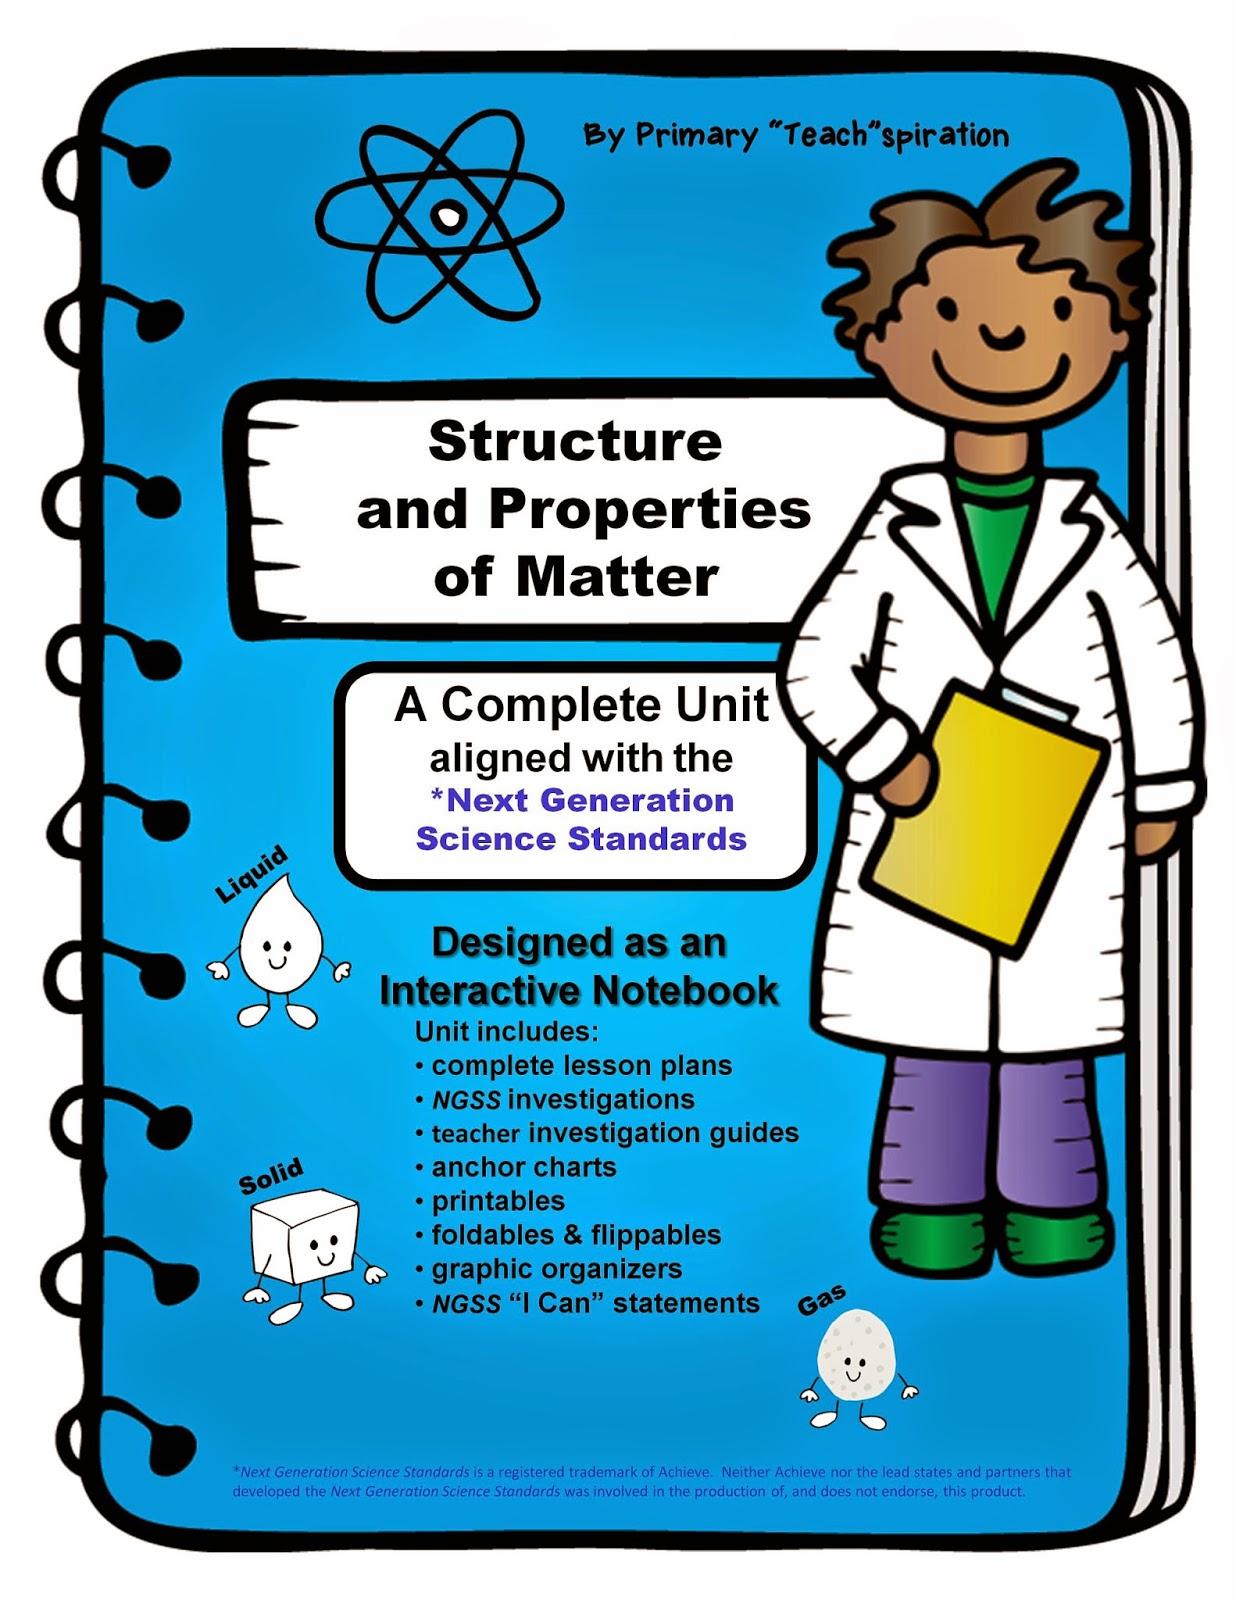 http://www.teacherspayteachers.com/Product/Matter-Next-Generation-Science-Interactive-Notebook-A-Complete-Unit-1129687